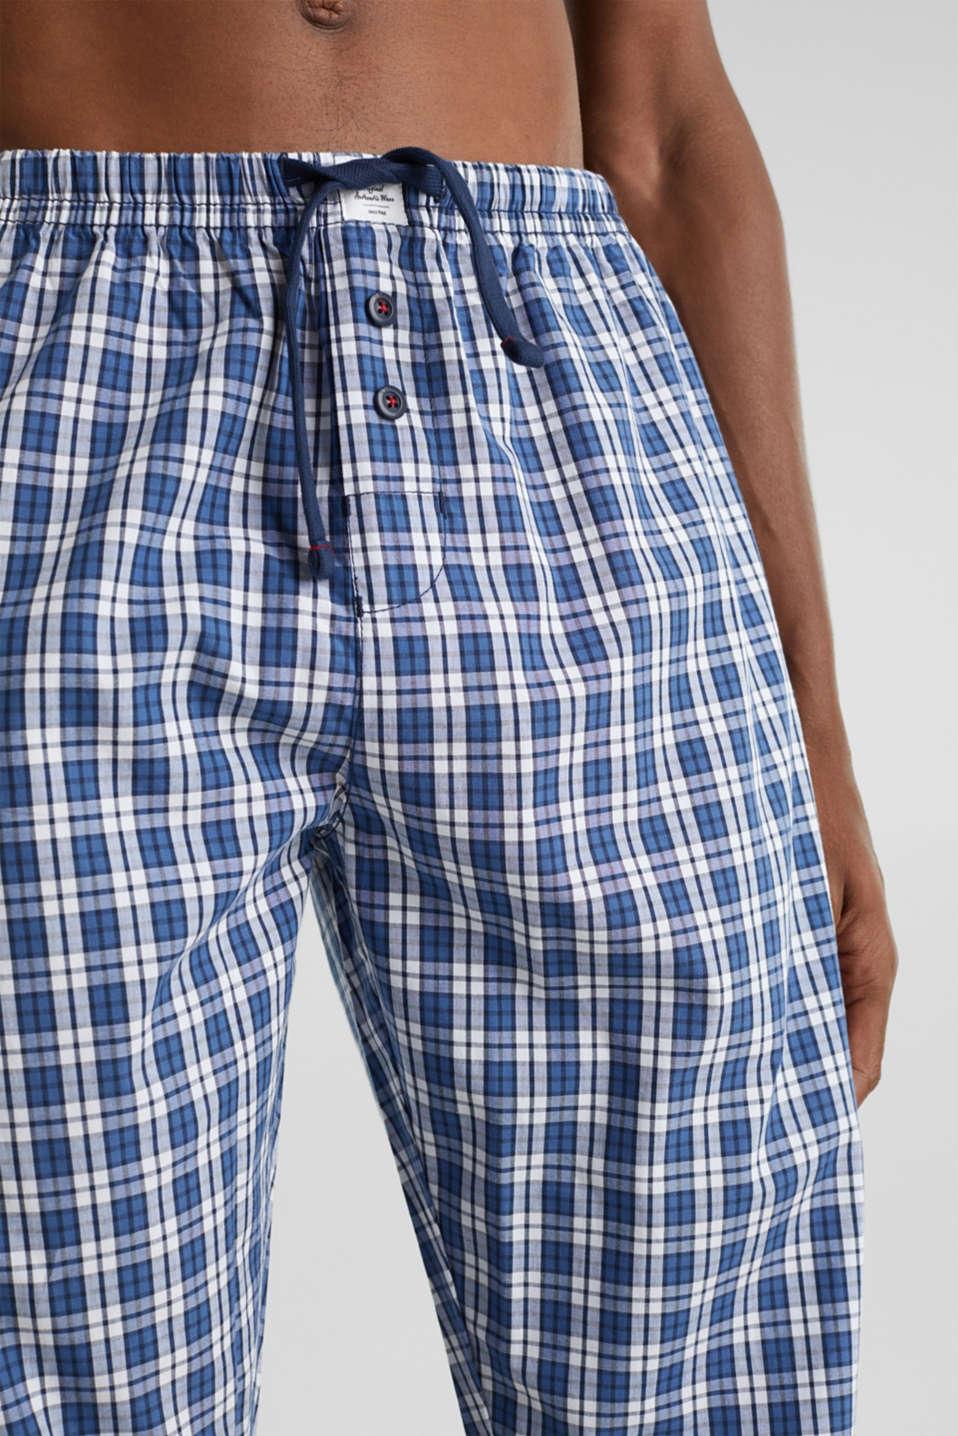 Pyjama bottoms made of 100% cotton, NAVY 2, detail image number 2